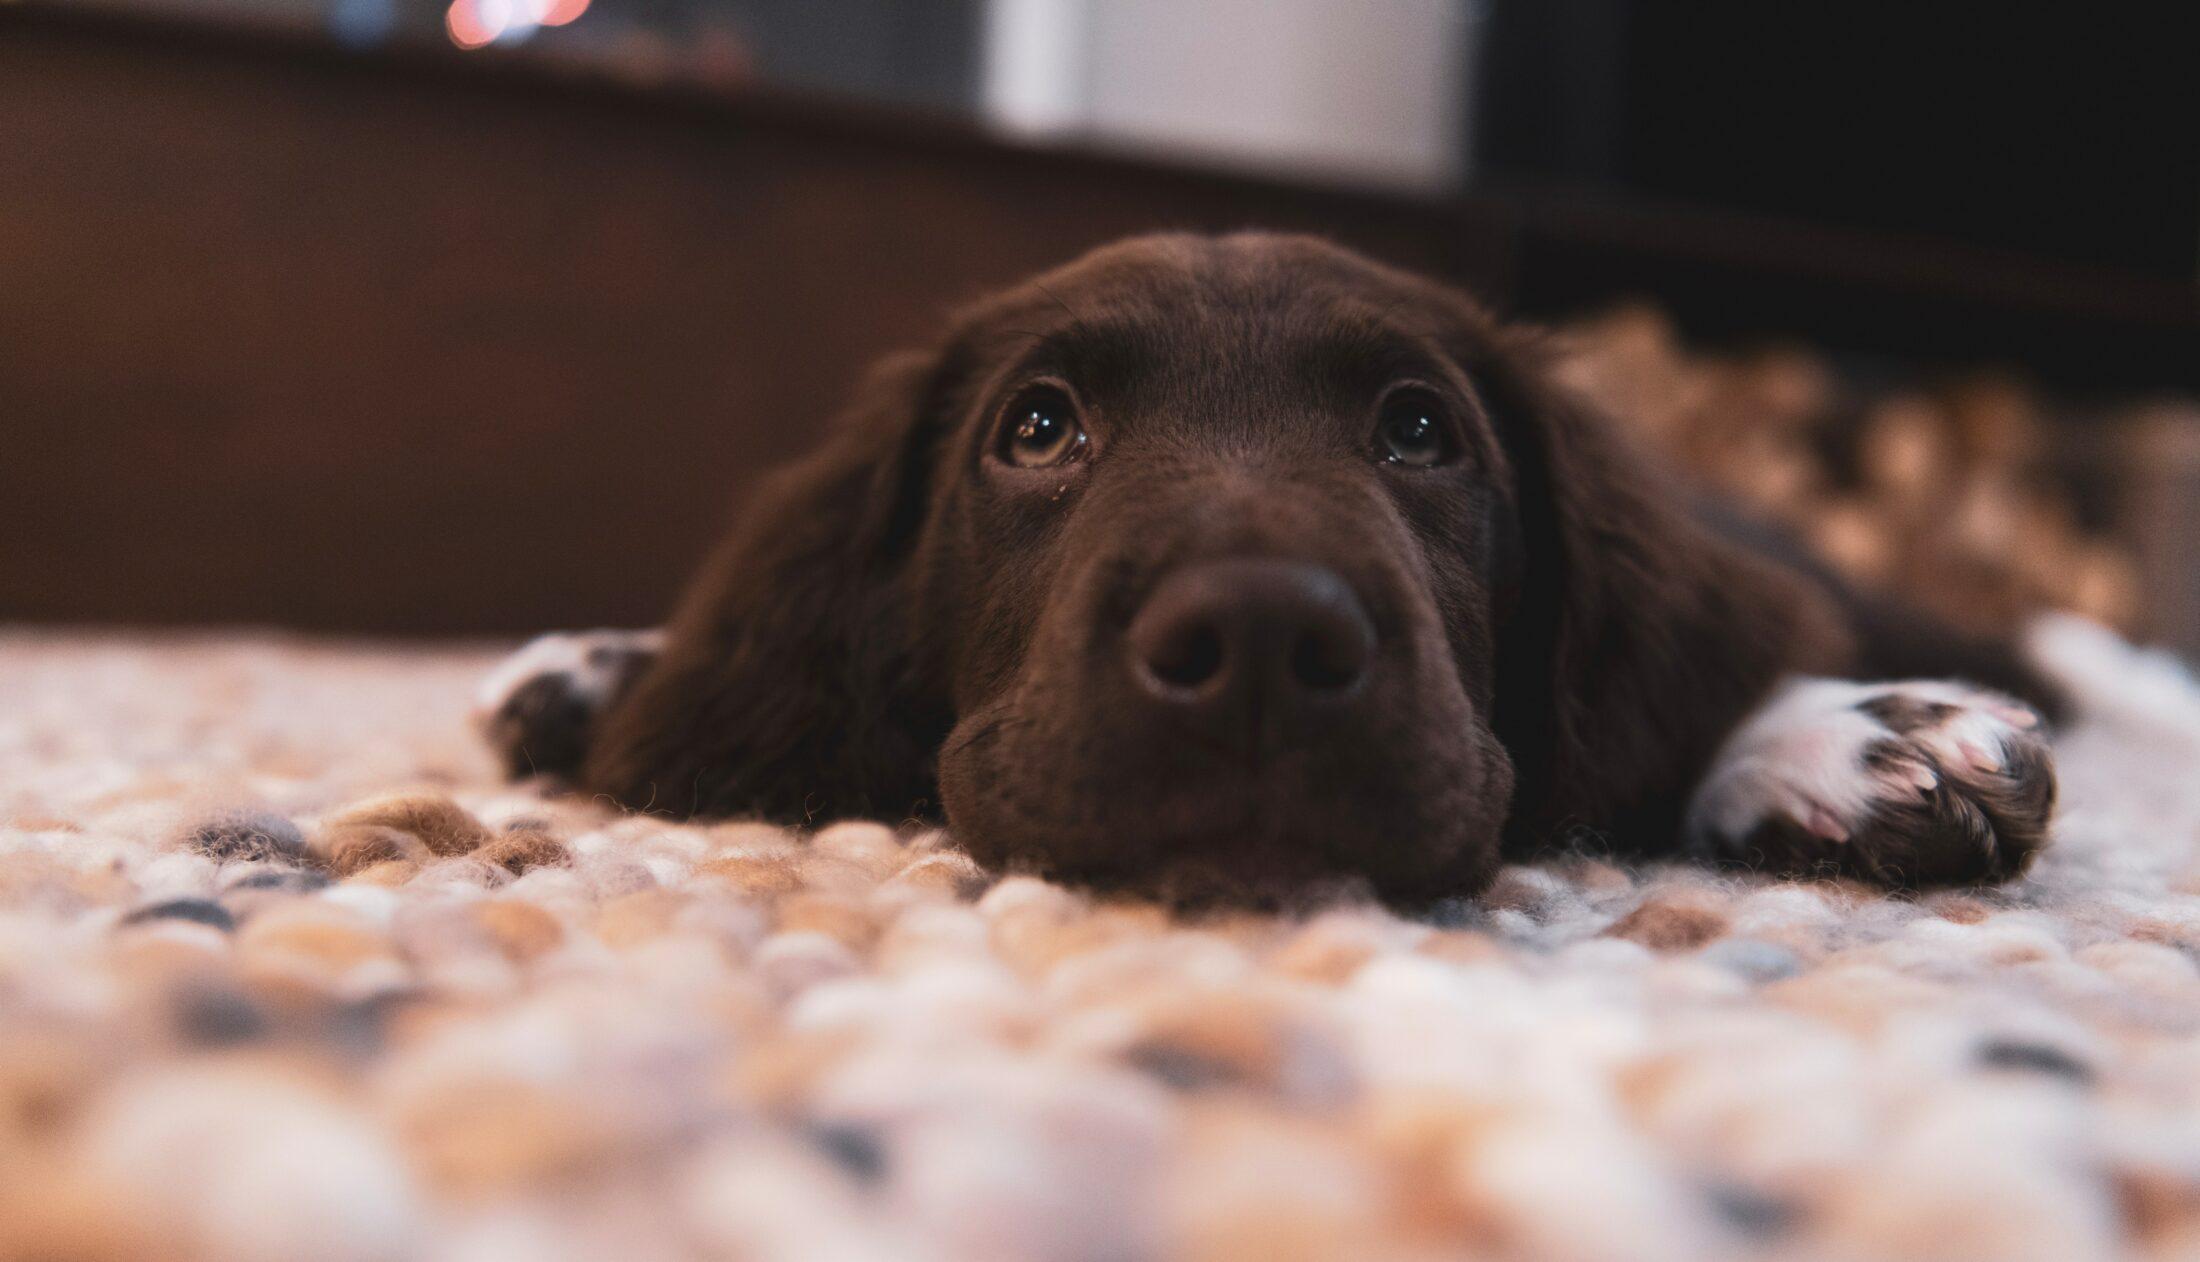 cachorro deitado no tapete